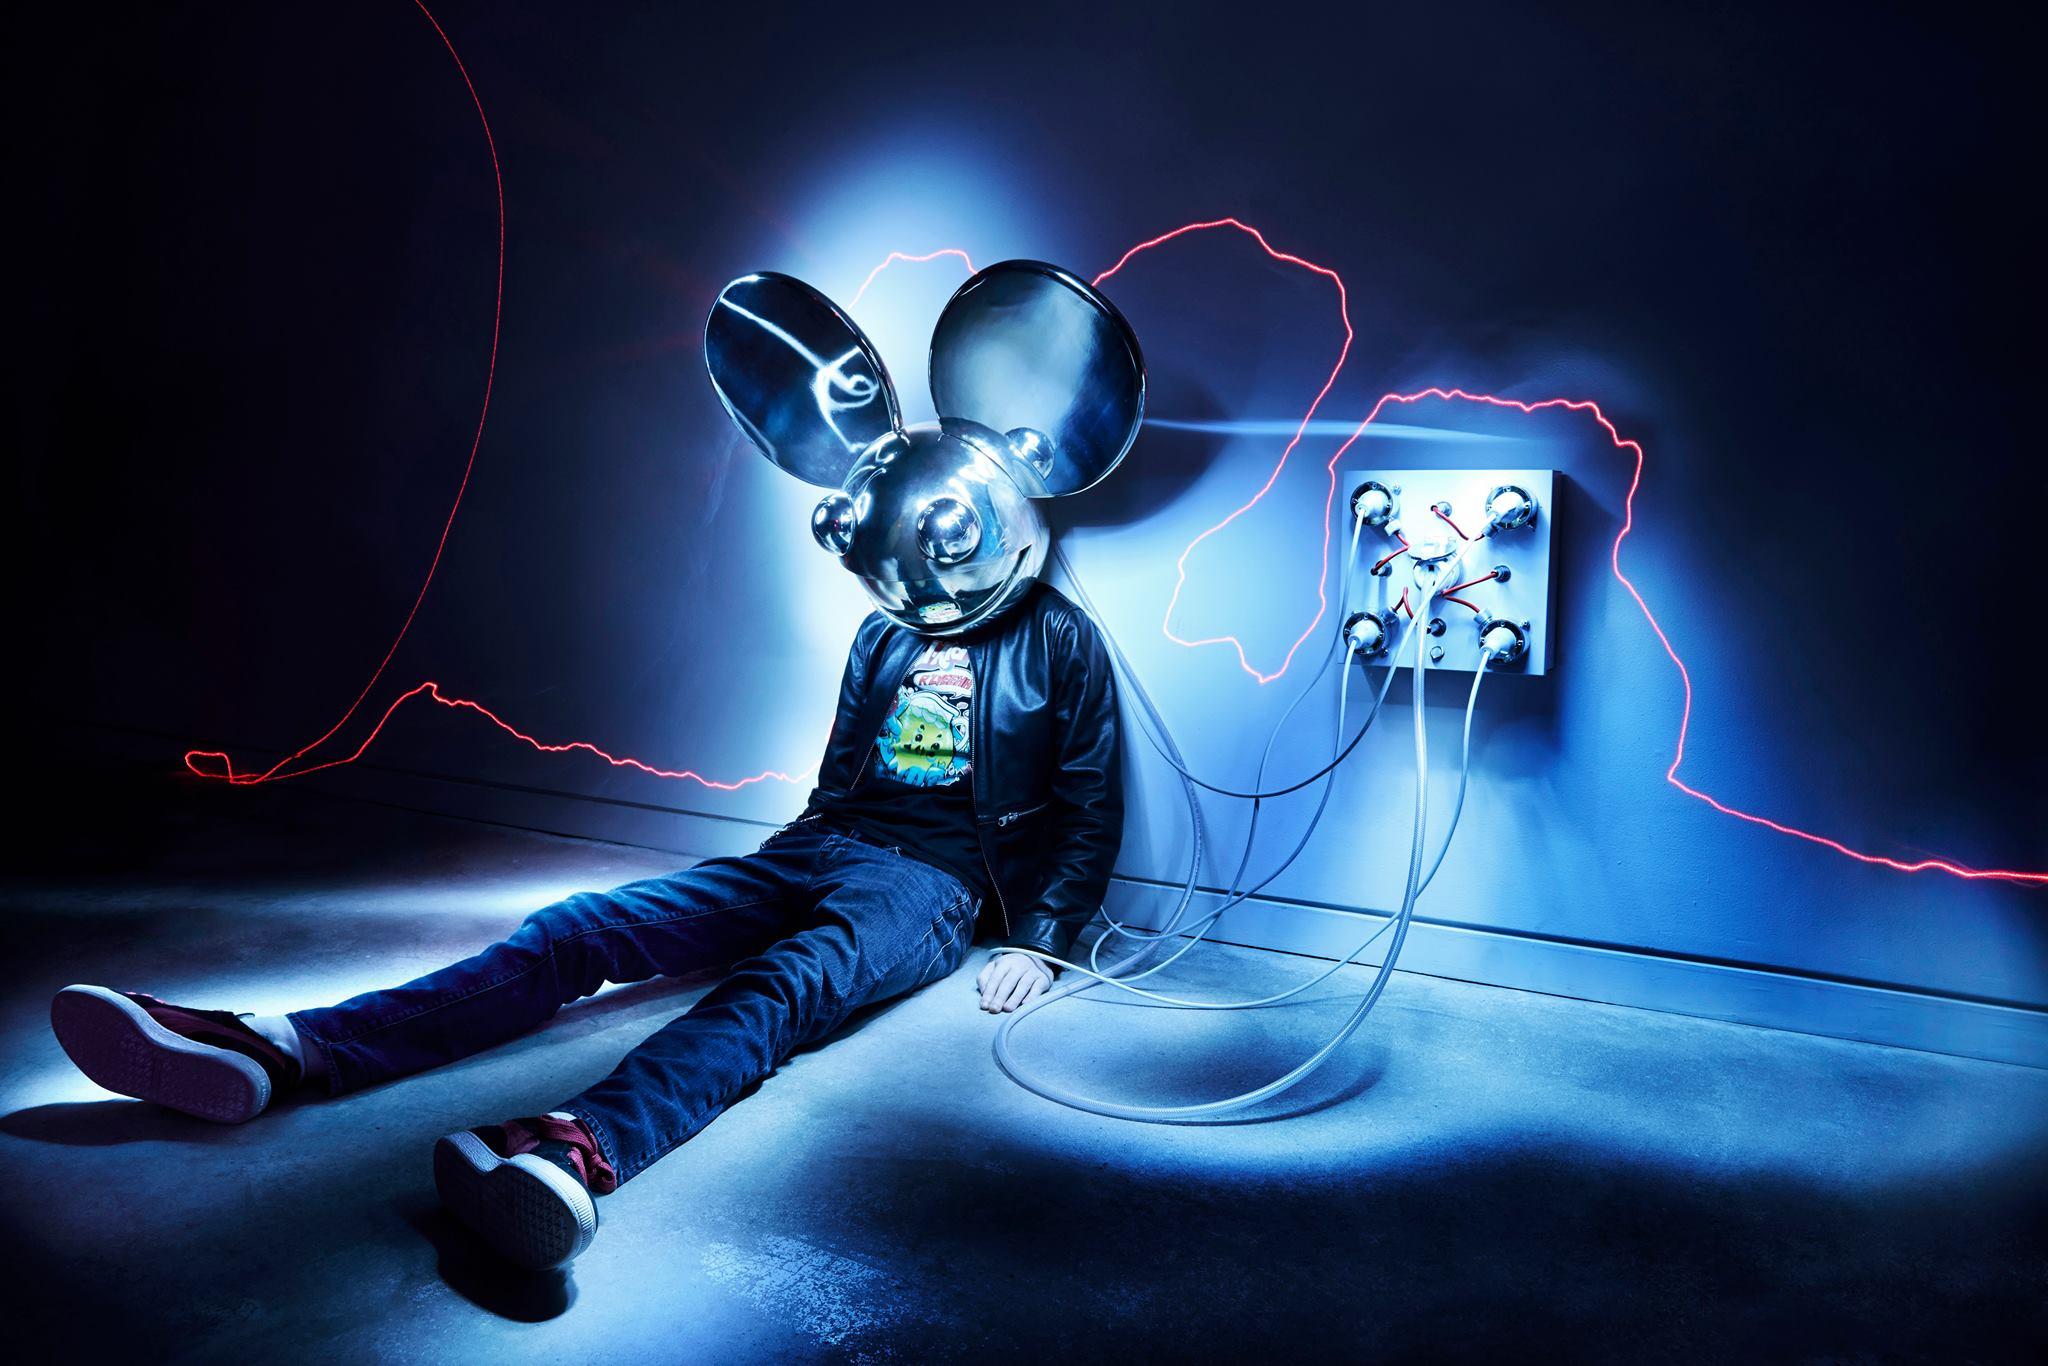 Deadmau5 Hd Wallpaper Background Image 2048x1366 Id 541095